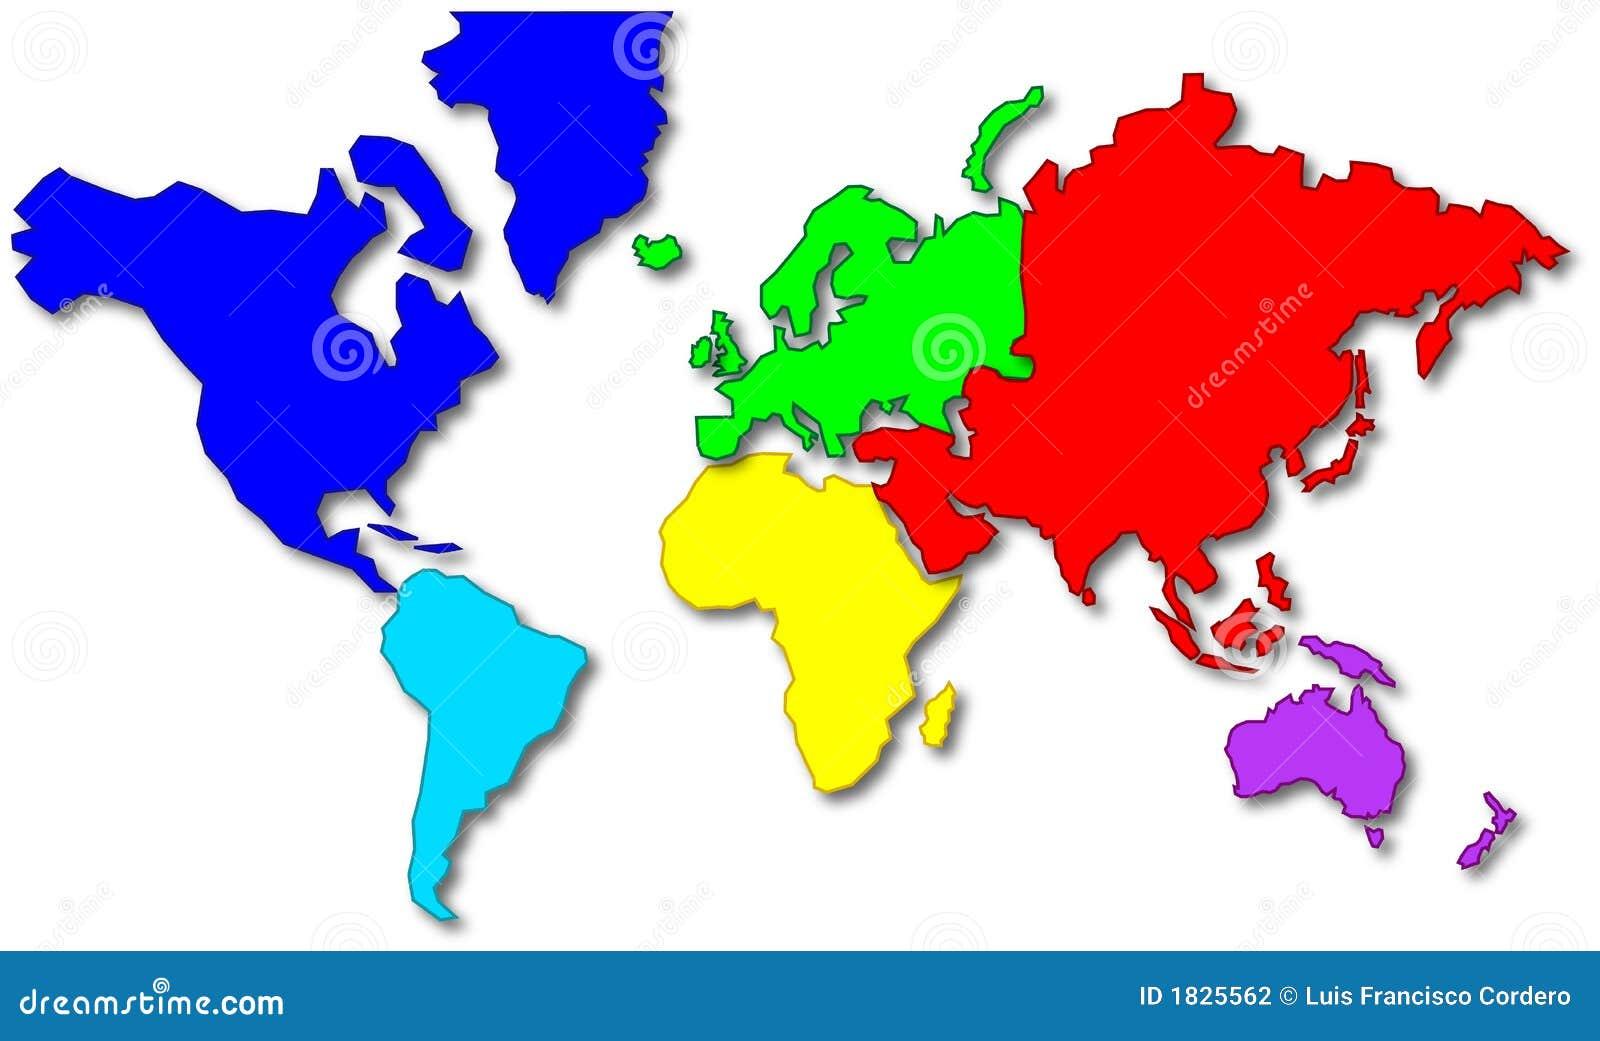 cartoon style world map stock photography image 1825562 army rank clipart army rank clipart